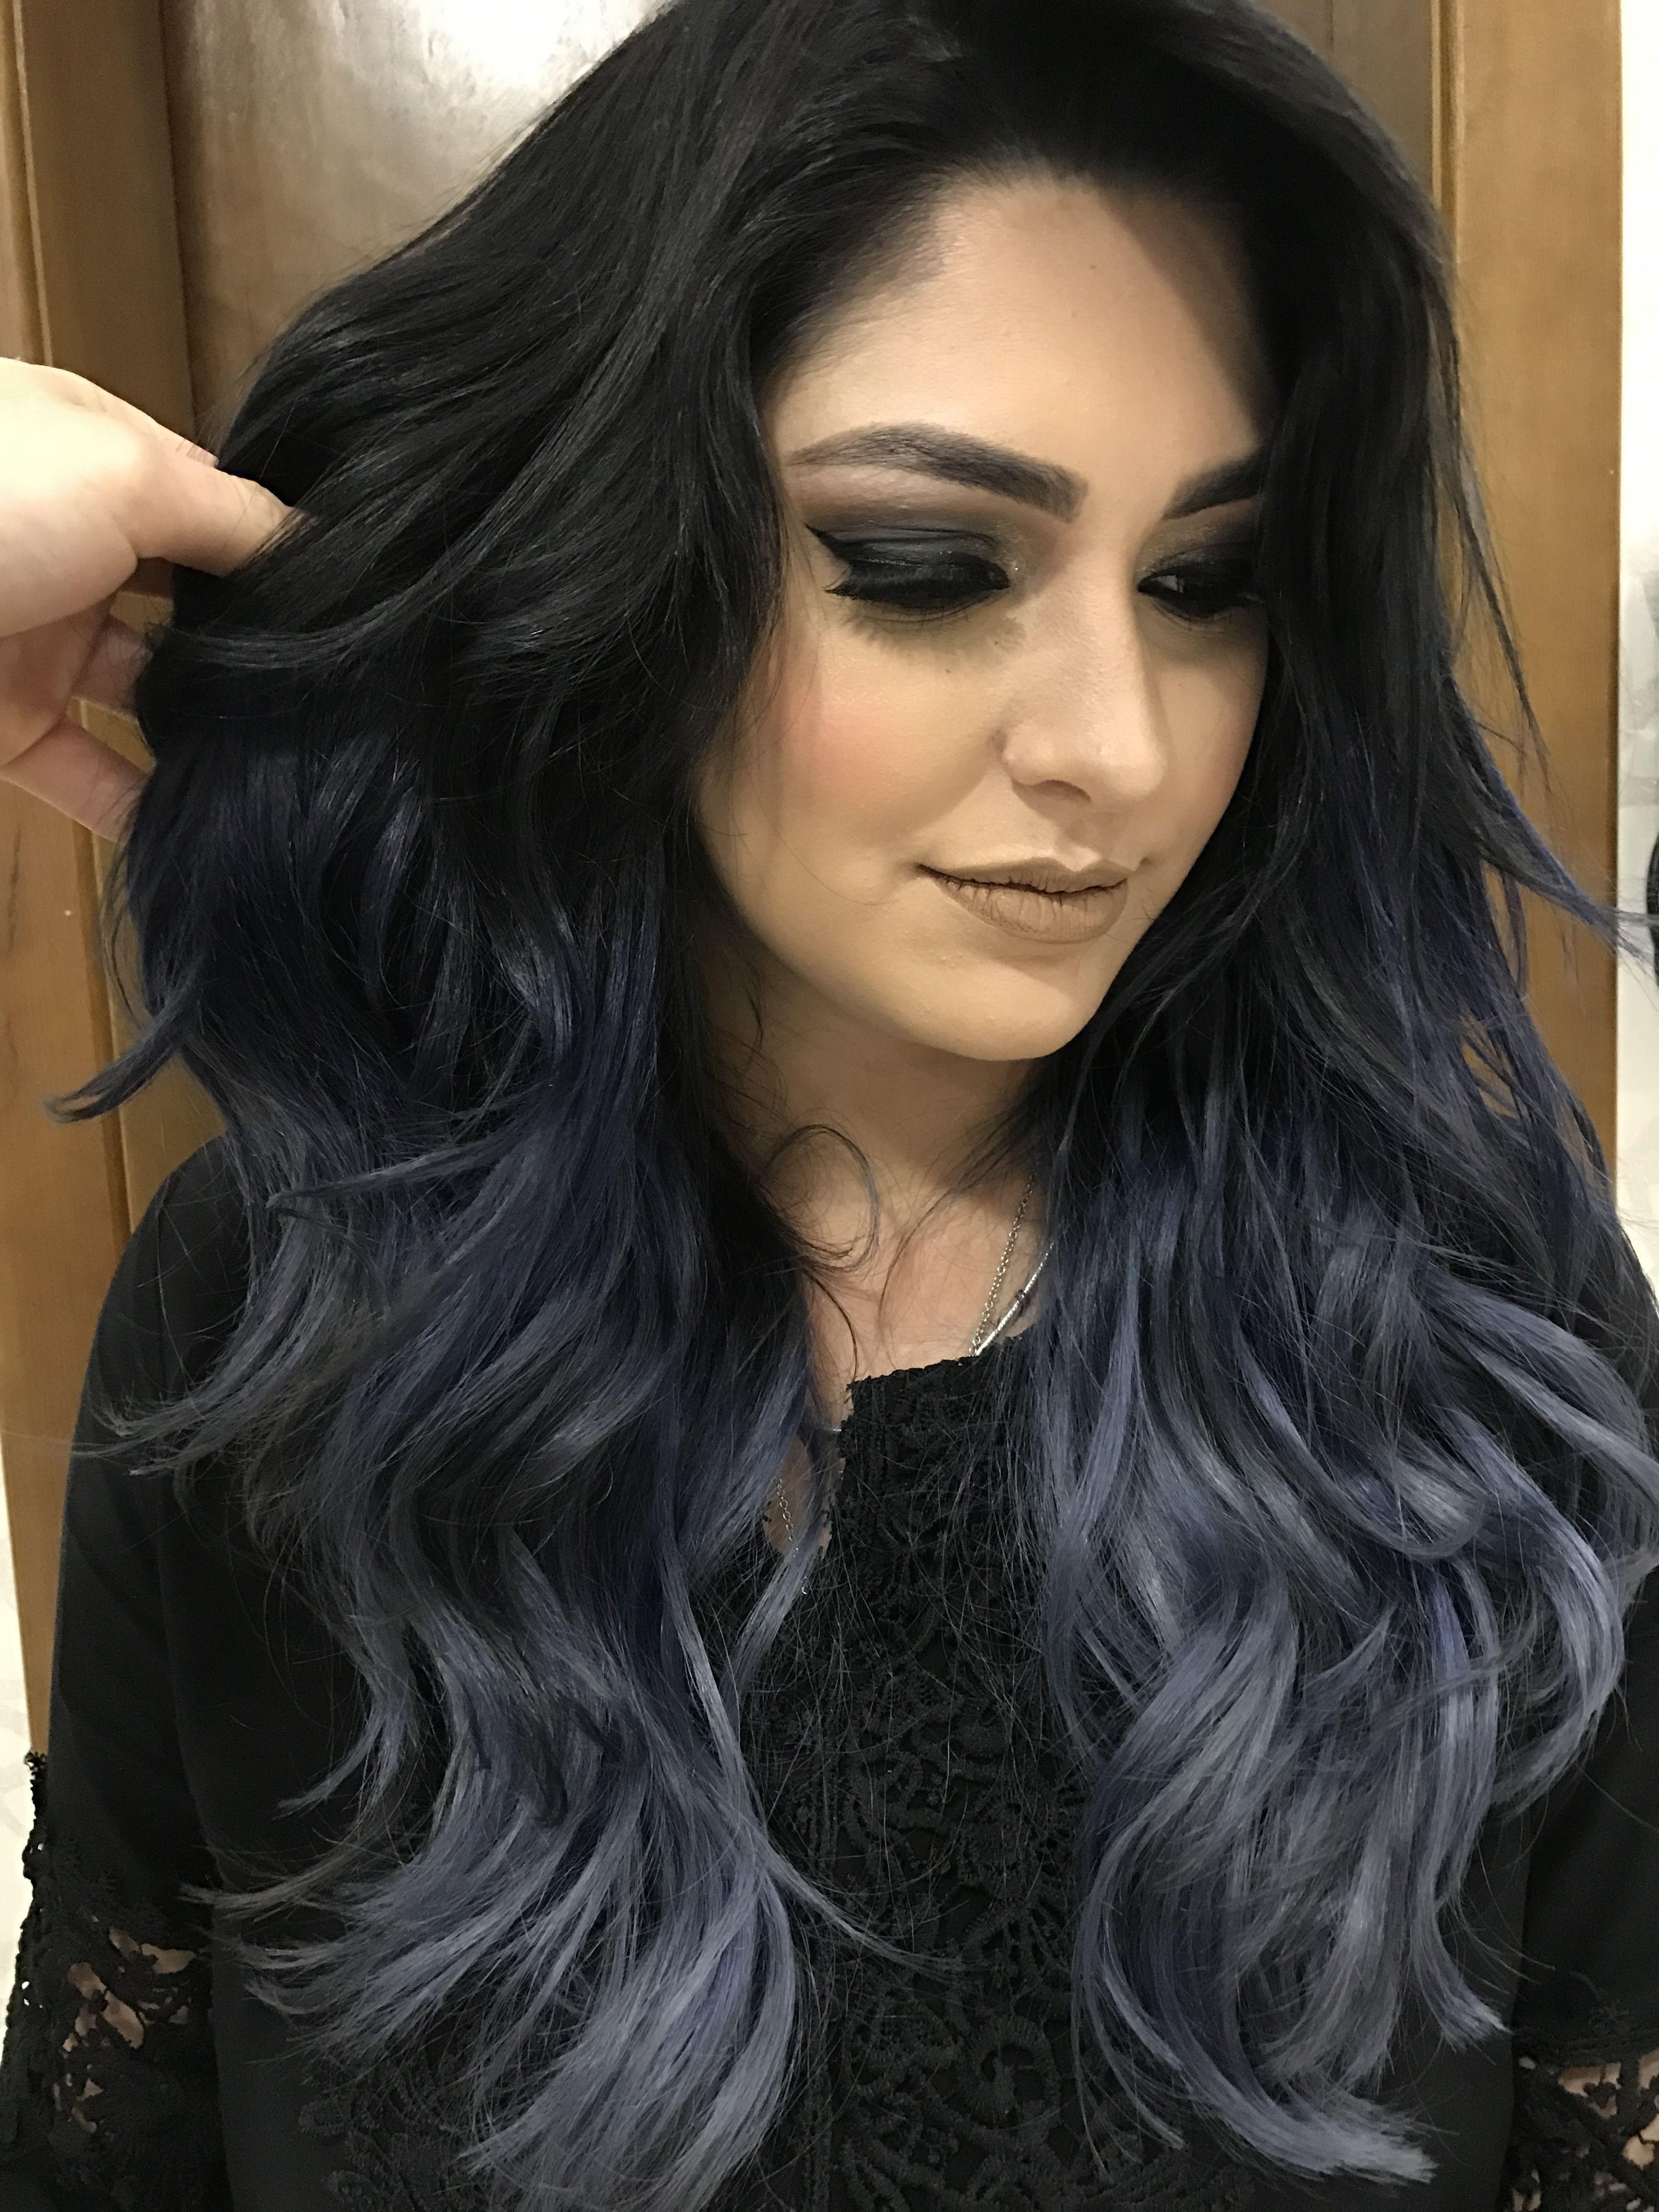 Charcoal Hair  Tendncia para um visual estiloso. Aposte ...